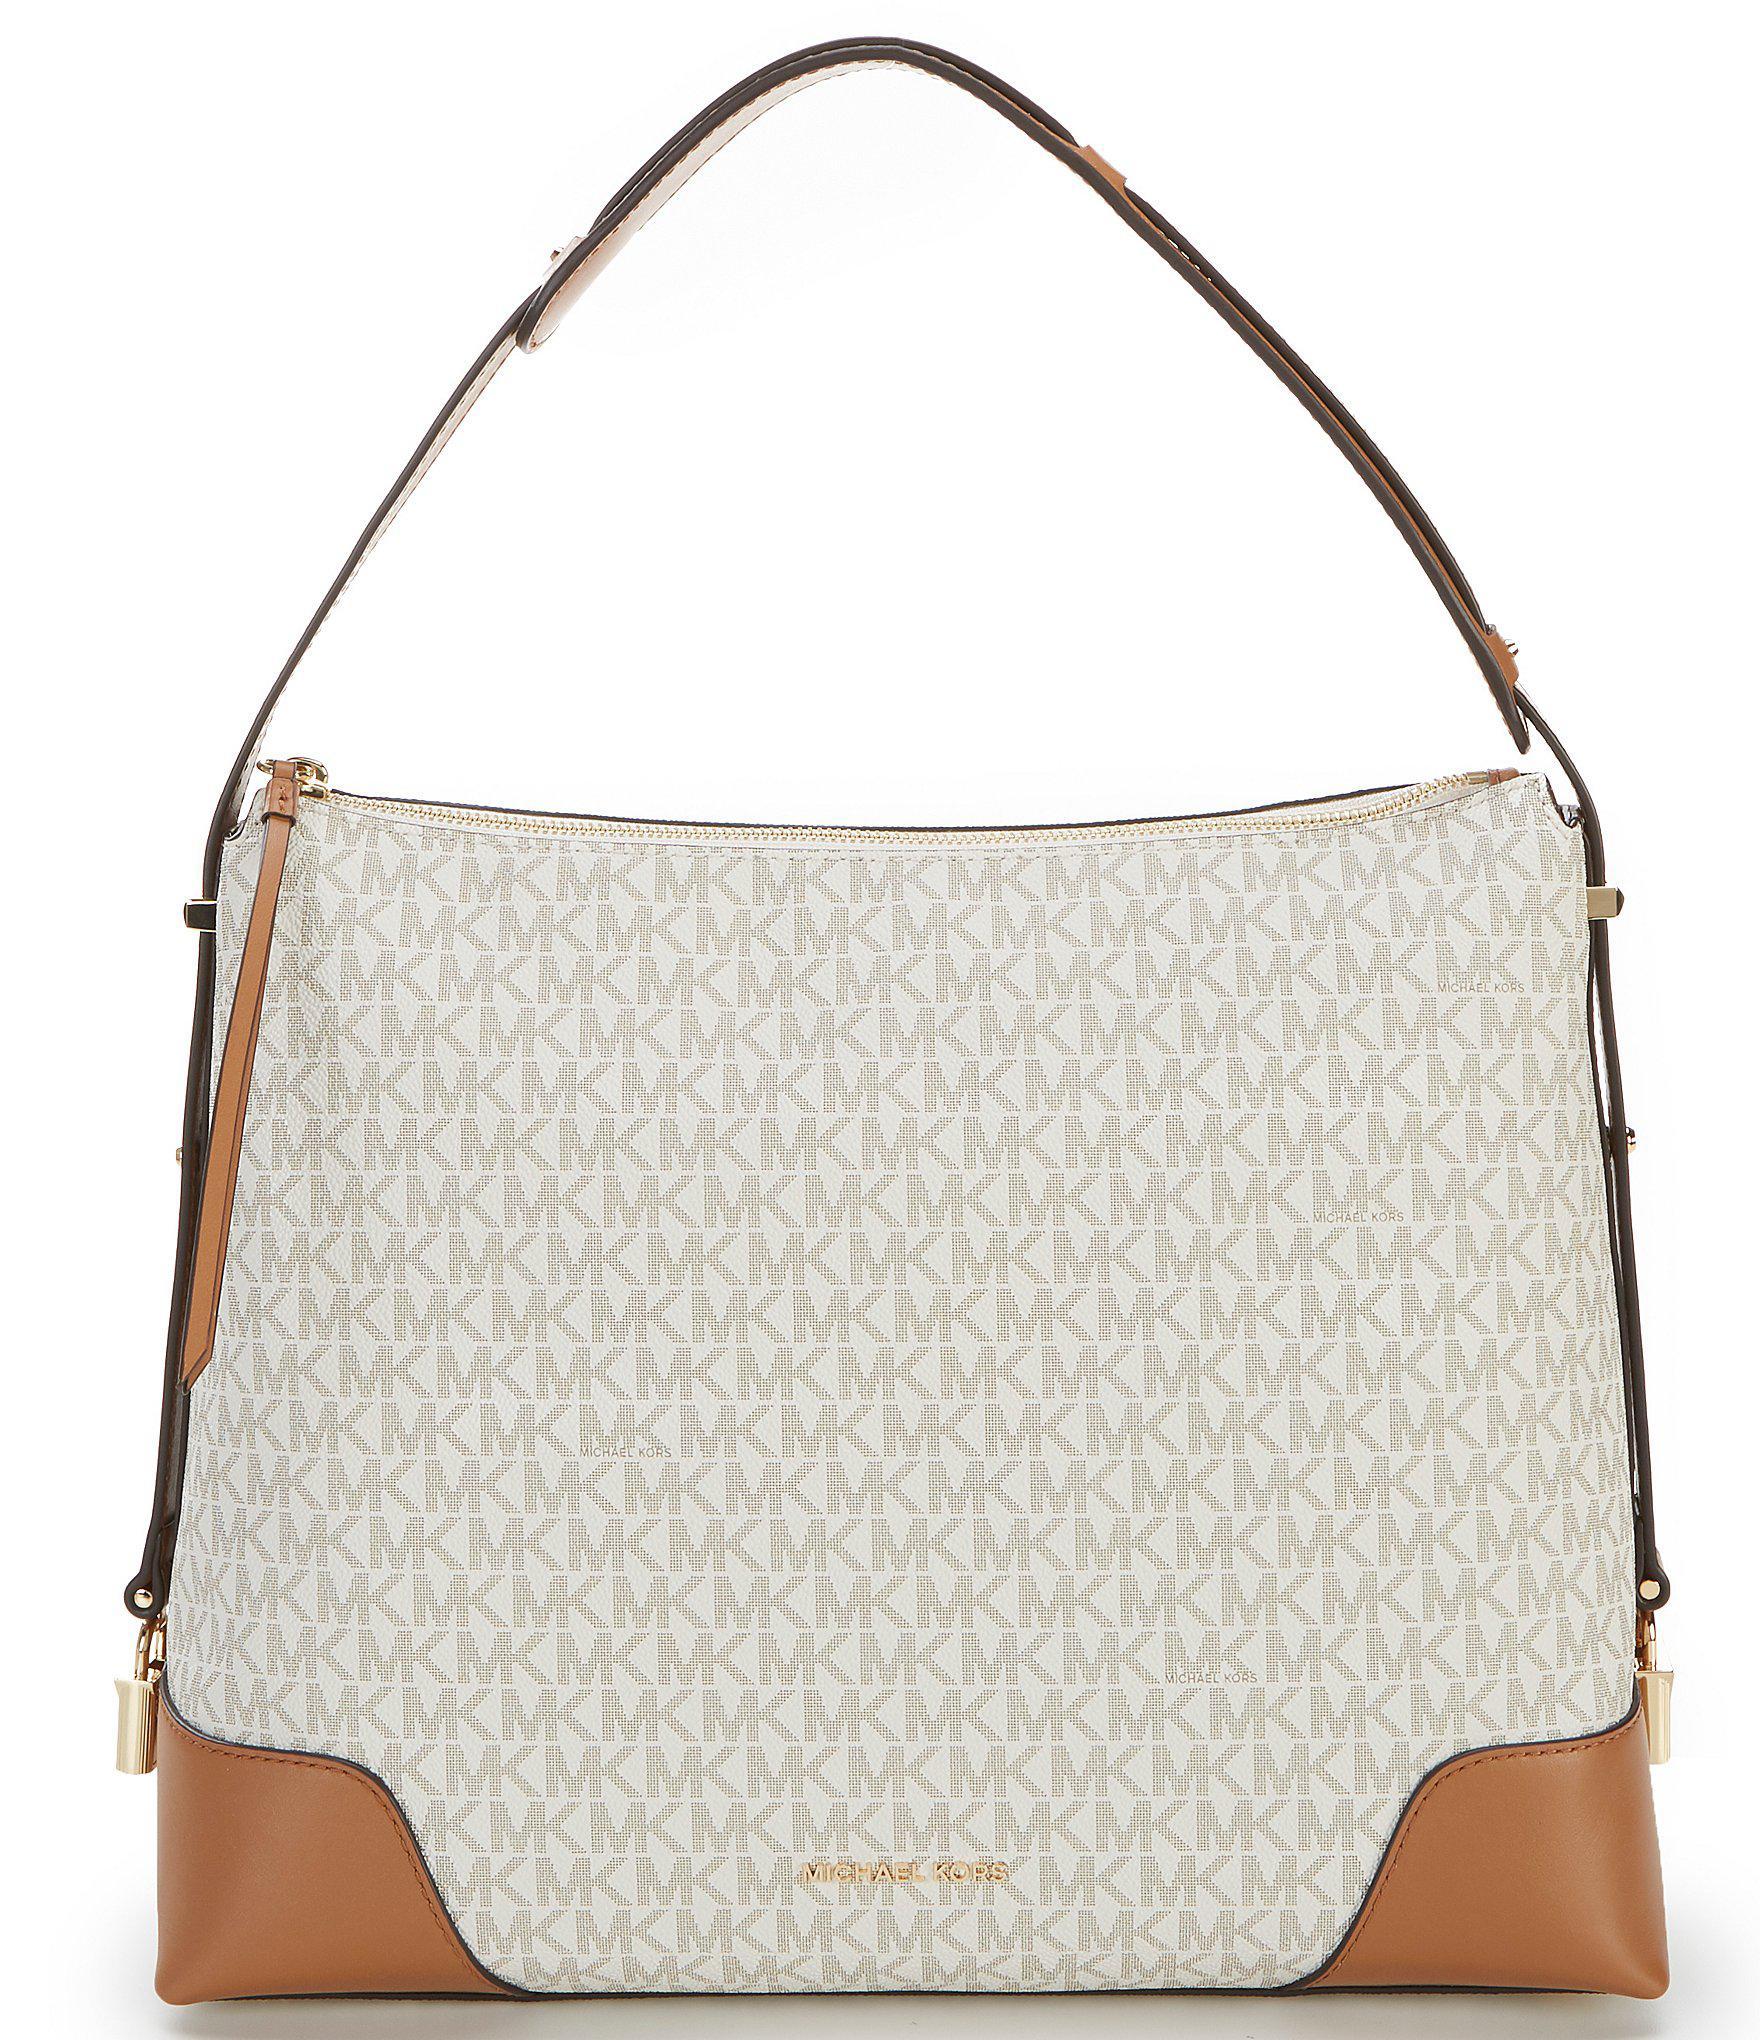 92f34350b489 Lyst - MICHAEL Michael Kors Crosby Large Twill Shoulder Bag